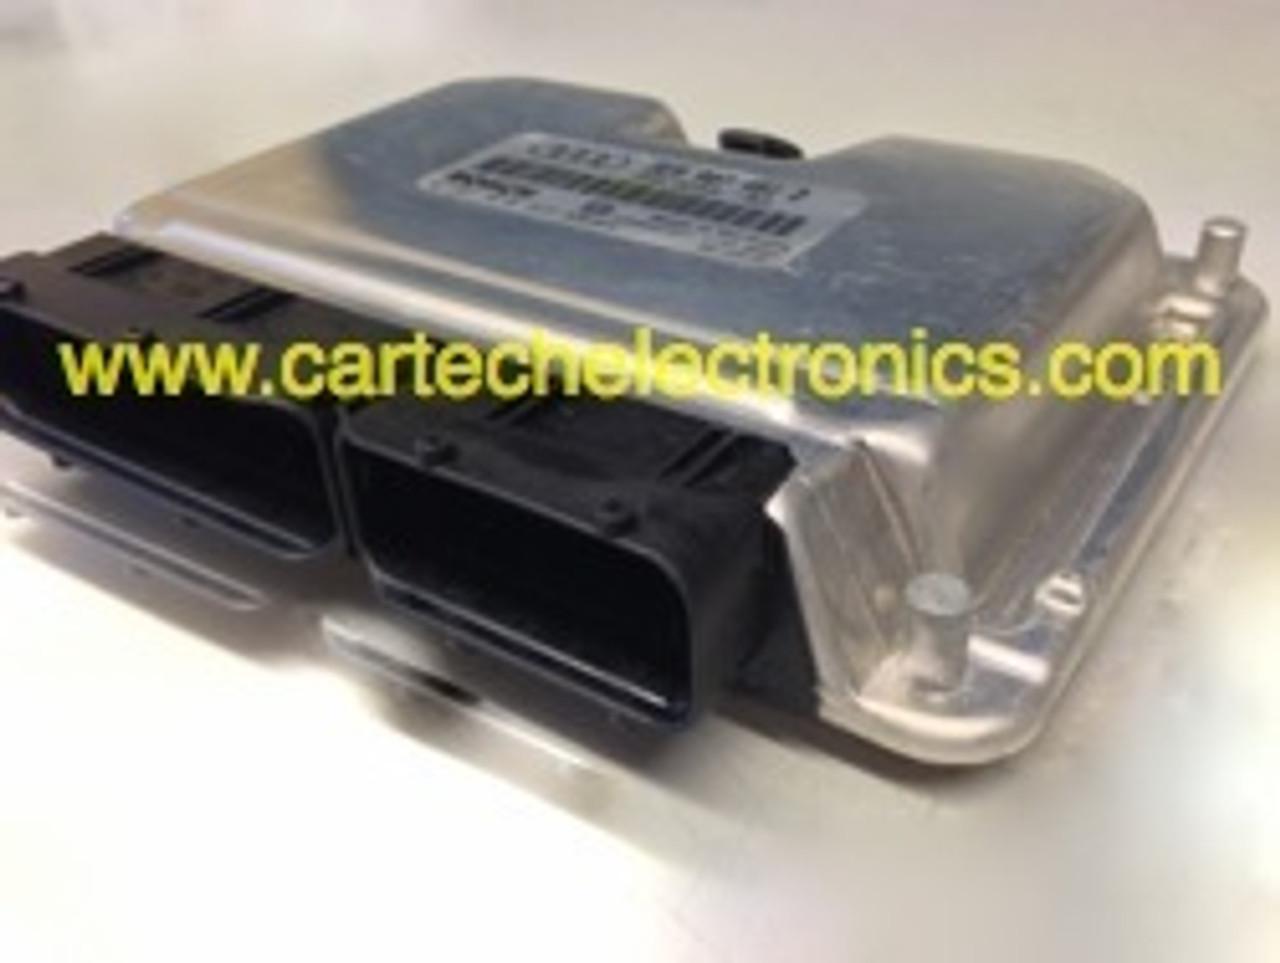 Plug & Play Engine ECU, Ford Galaxy, VW Sharan 1.9 TDI, 0281011198, 0 281 011 198, 038906019LD, 038 906 019 LD, EDC15P+